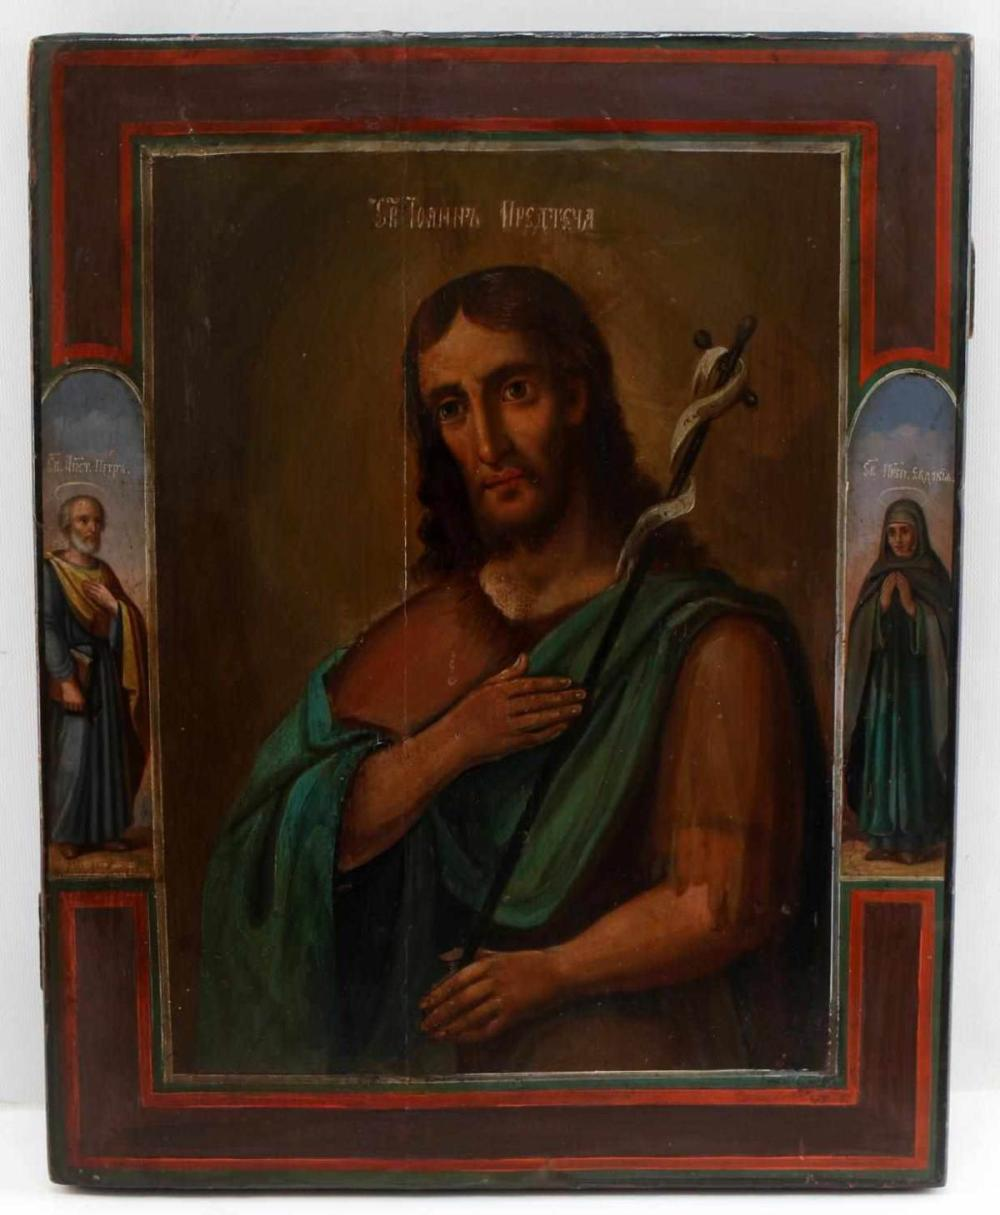 ANTIQUE 19TH CENTURY ICON OF JOHN THE BAPTIST